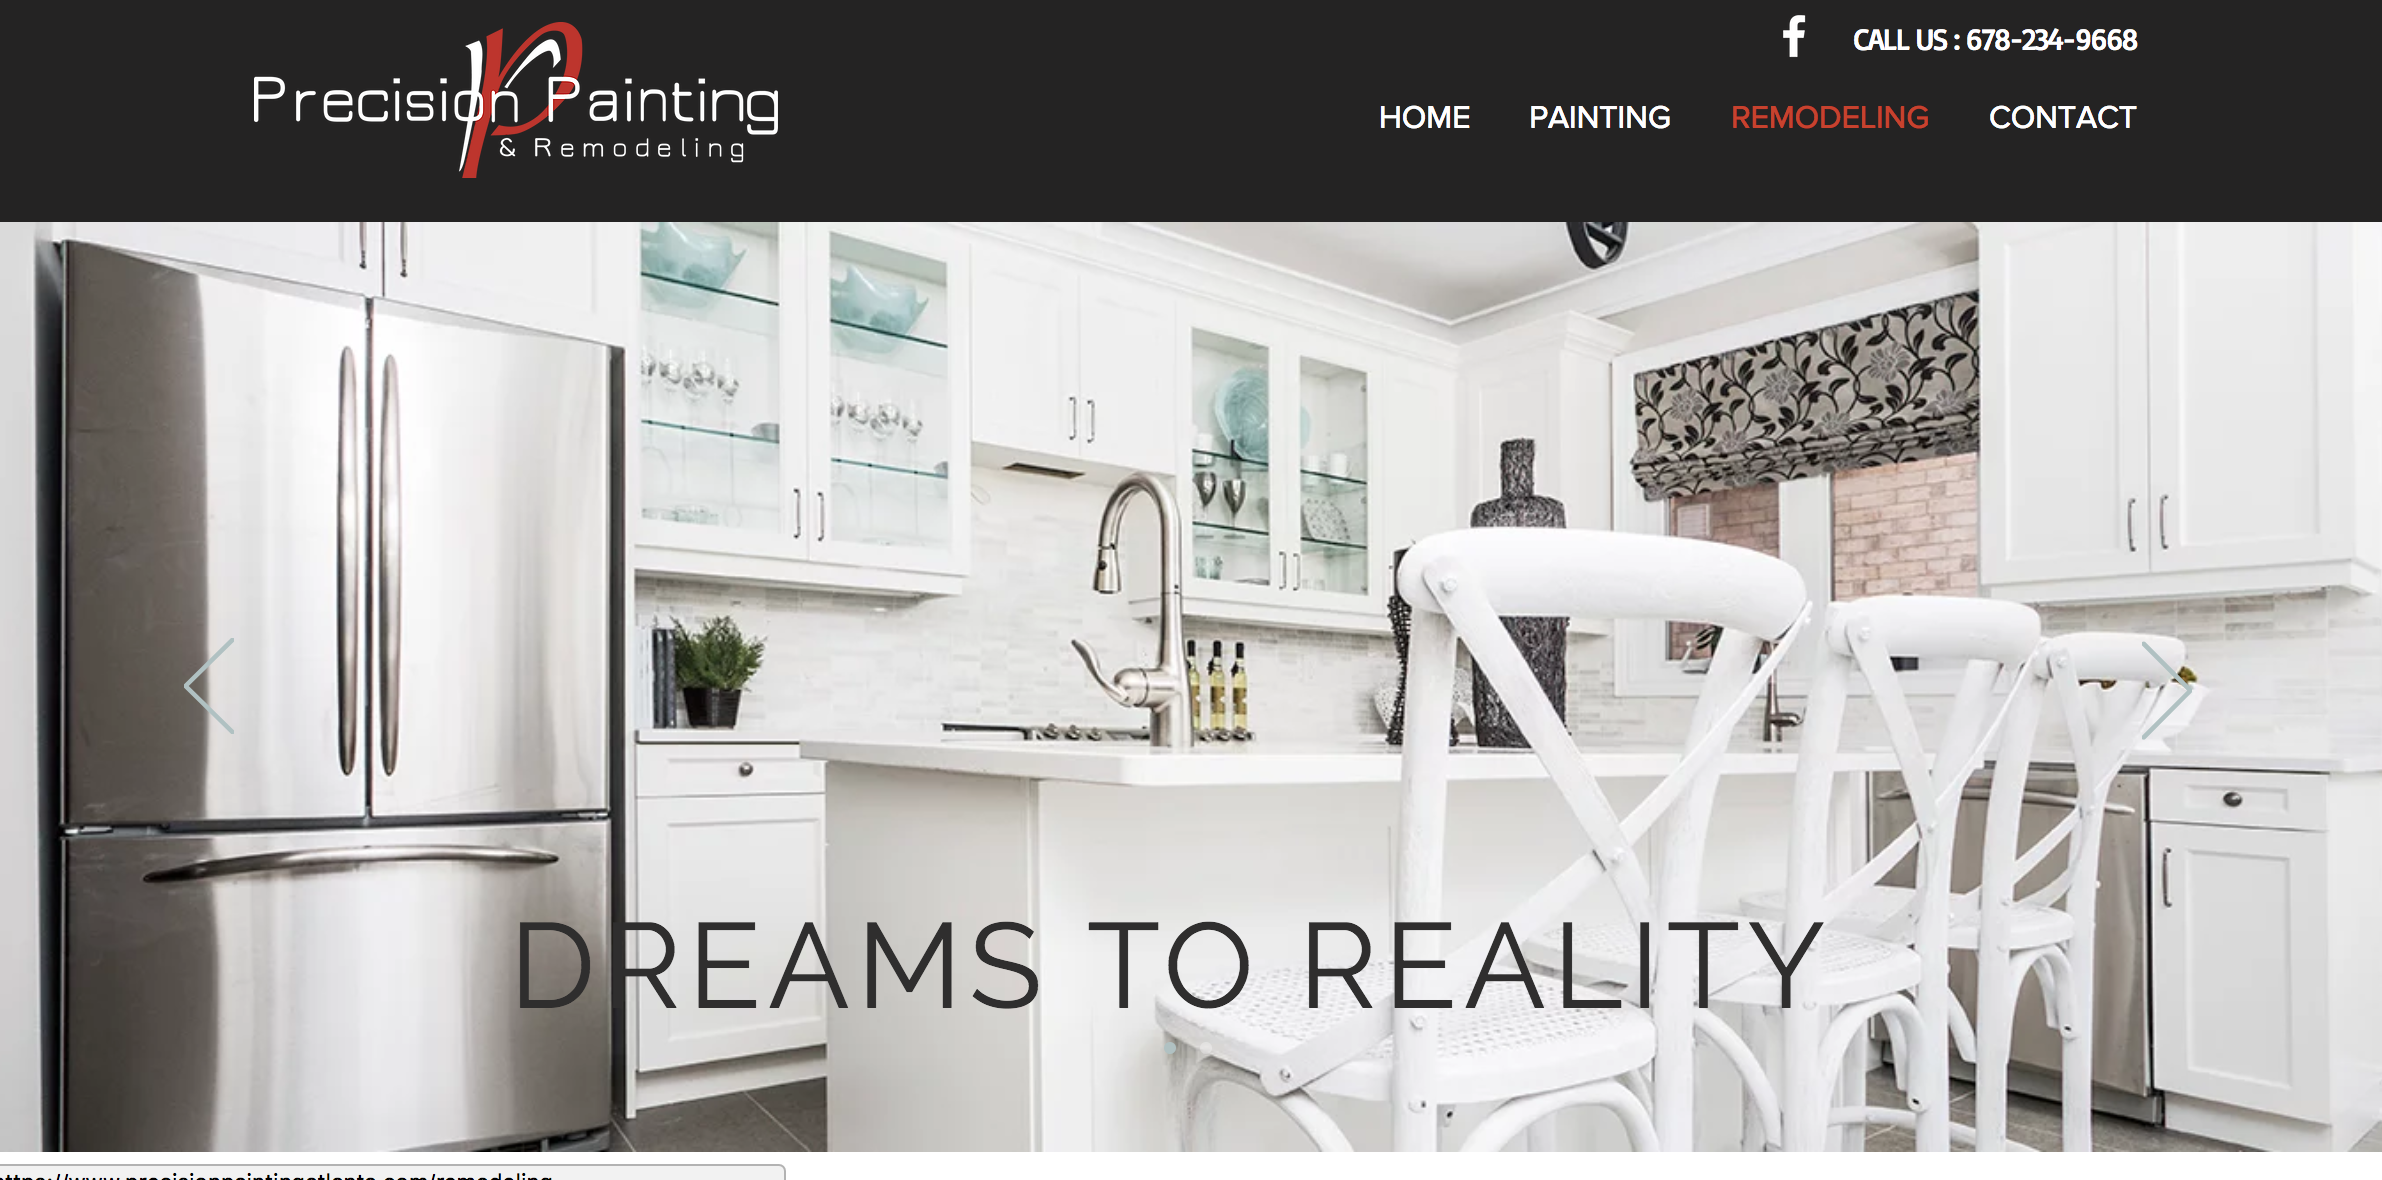 Precision Painting Mini Website